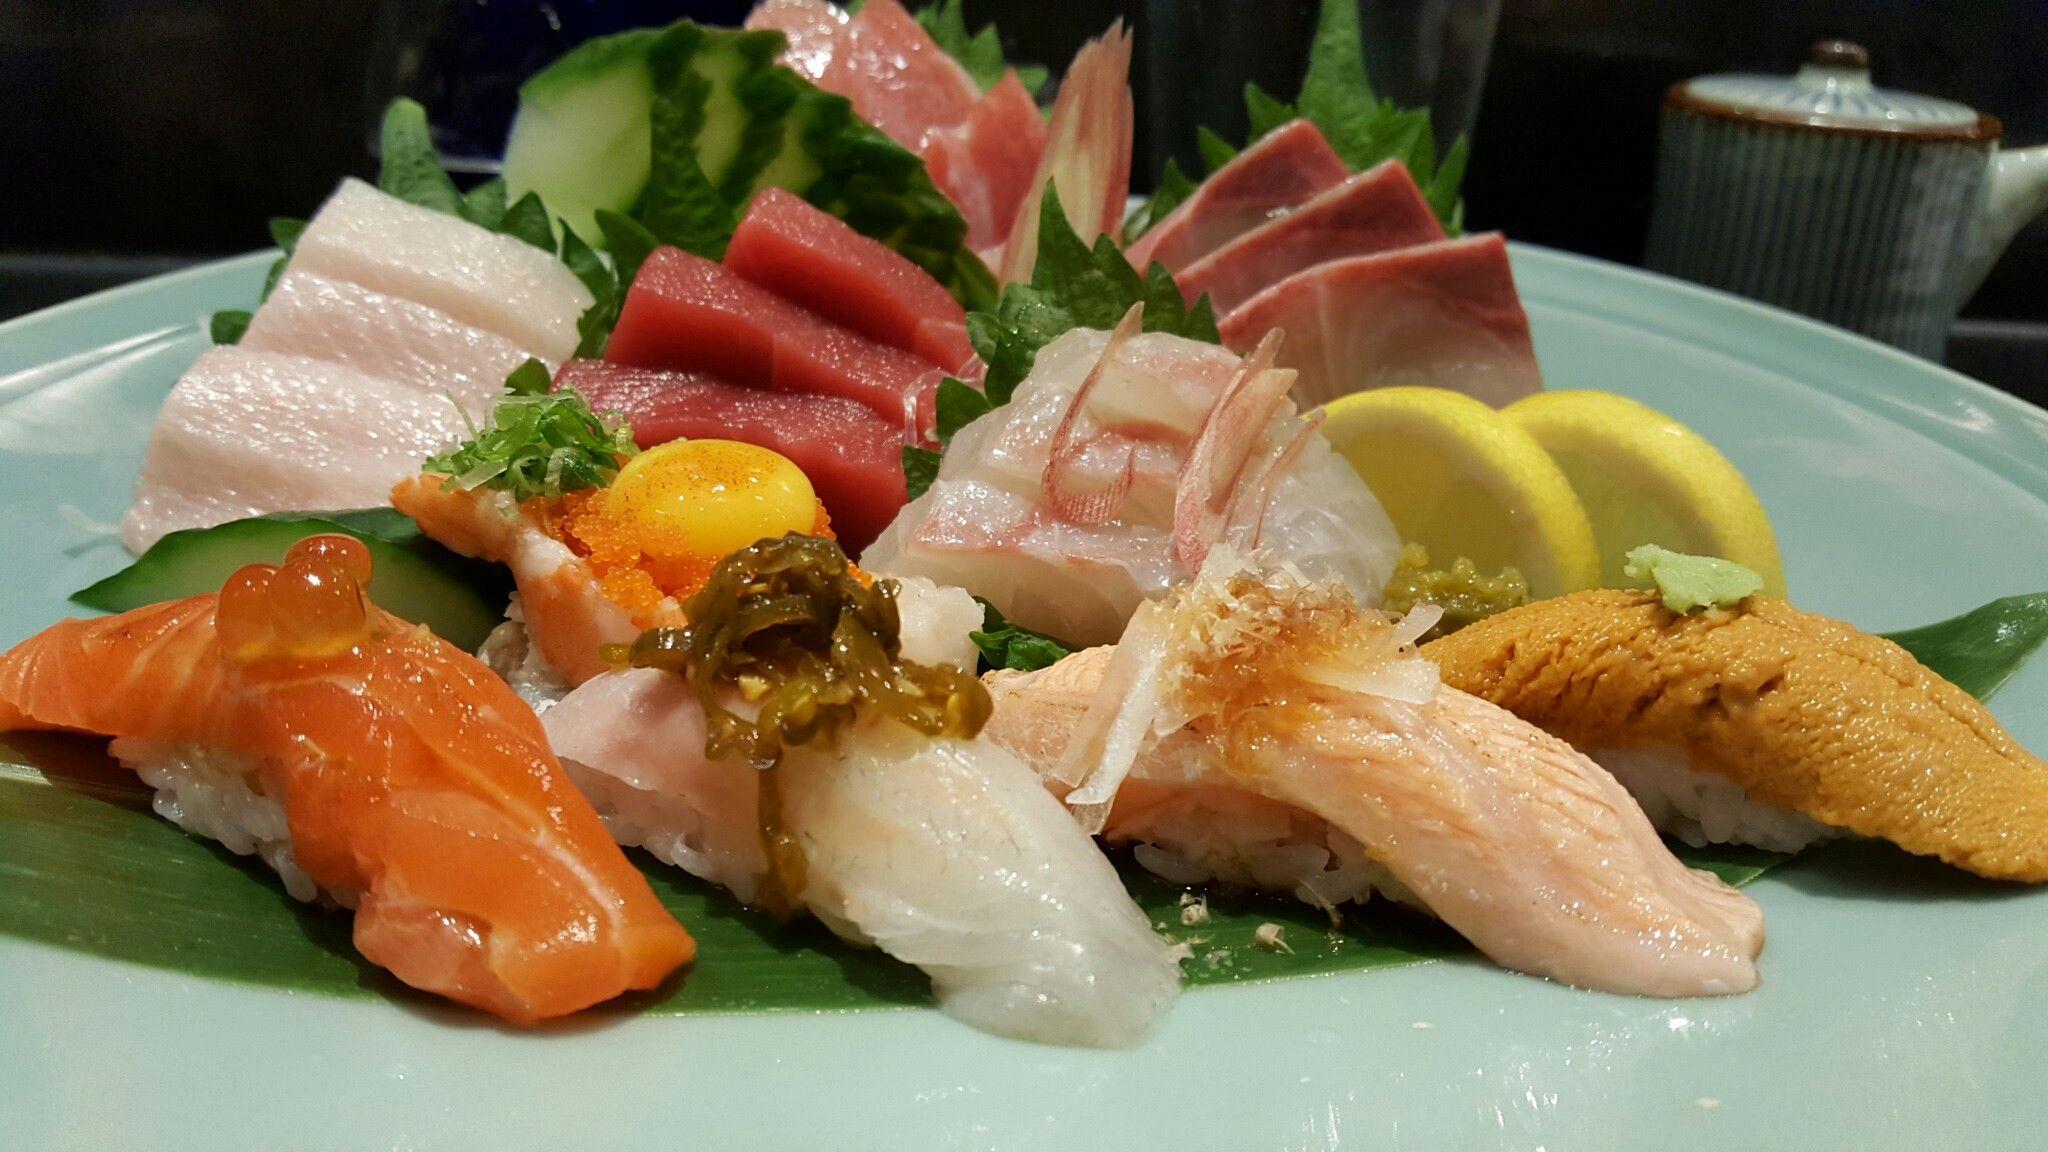 sushi and sashimi pinterest sashimi japanese. Black Bedroom Furniture Sets. Home Design Ideas